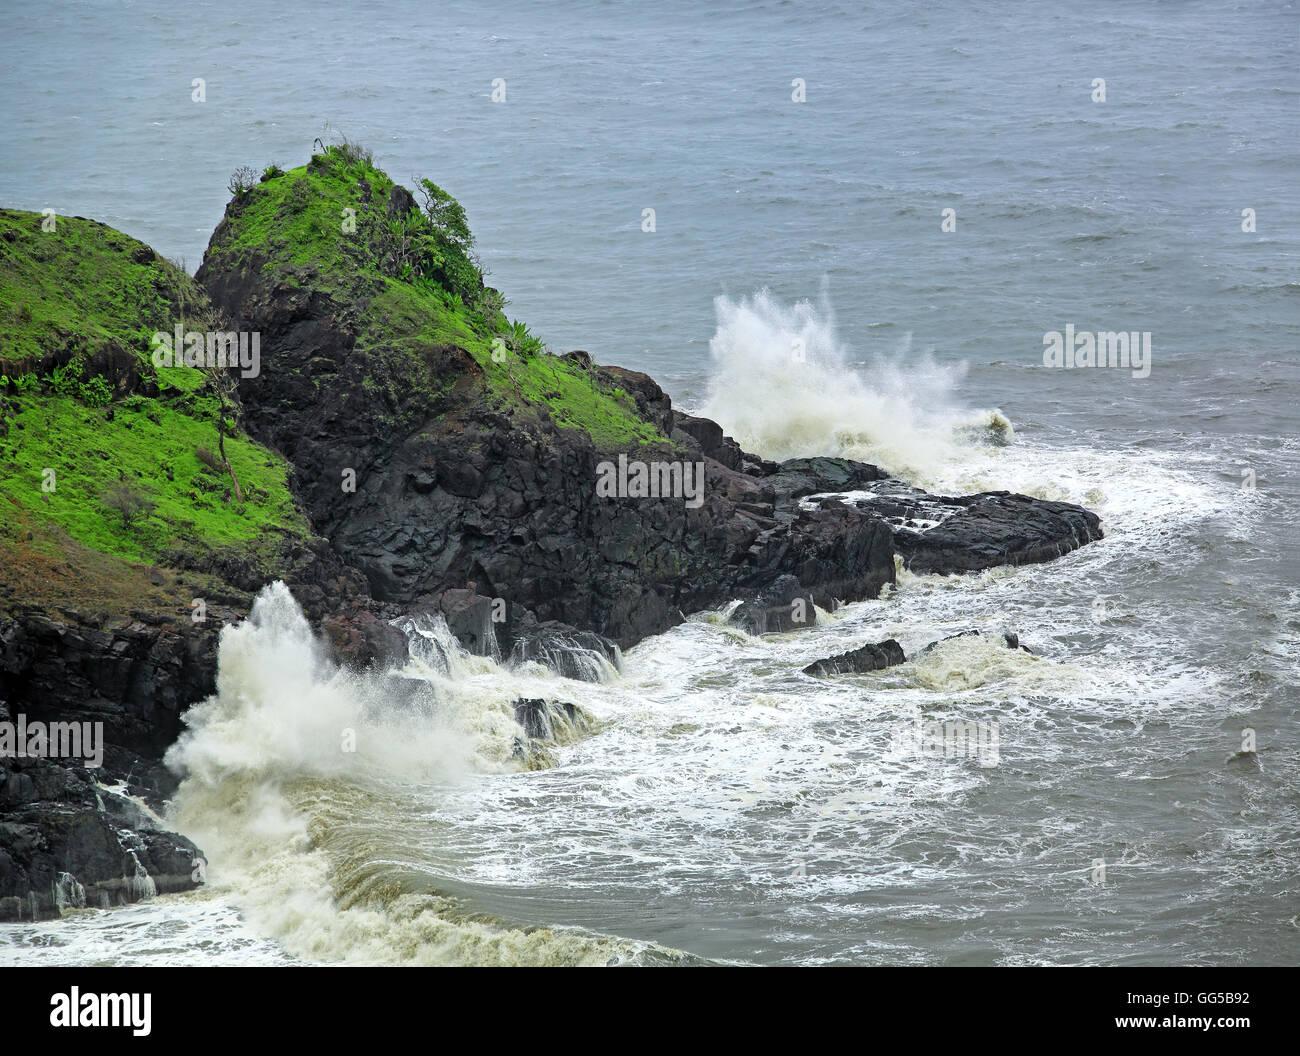 Ocean waves breaking and splashing on rocky cliff during monsoon season in Goa, India. - Stock Image